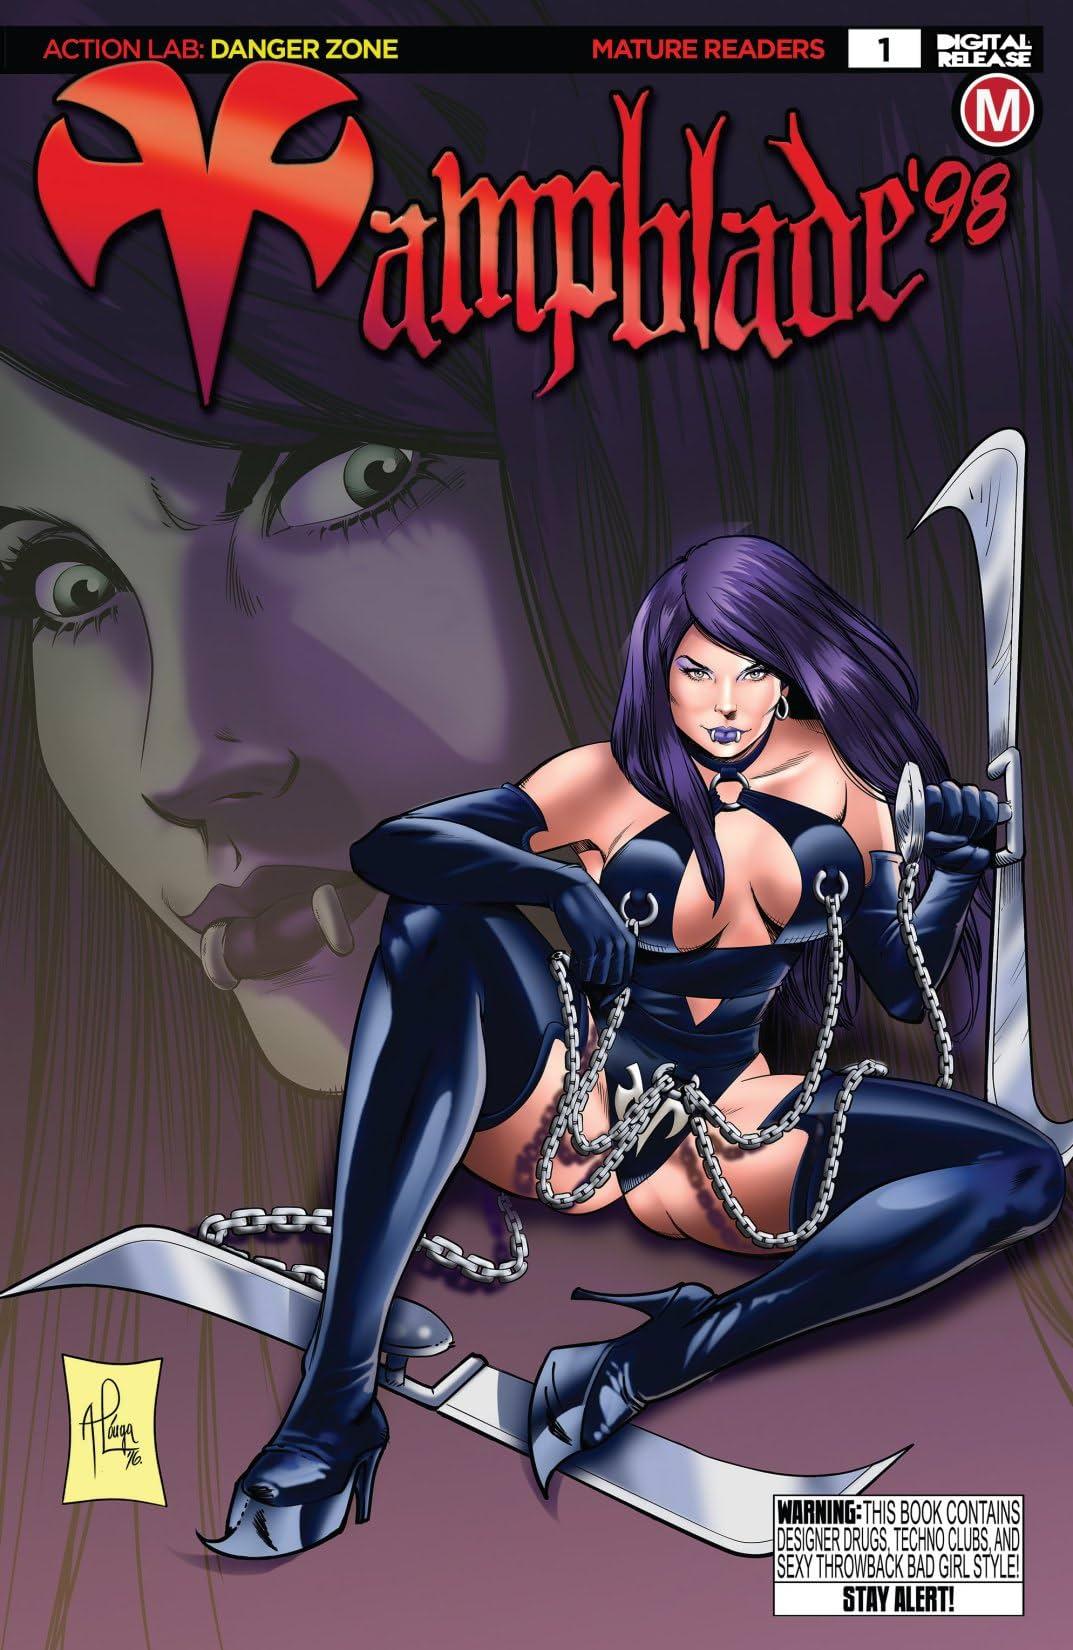 Vampblade '98